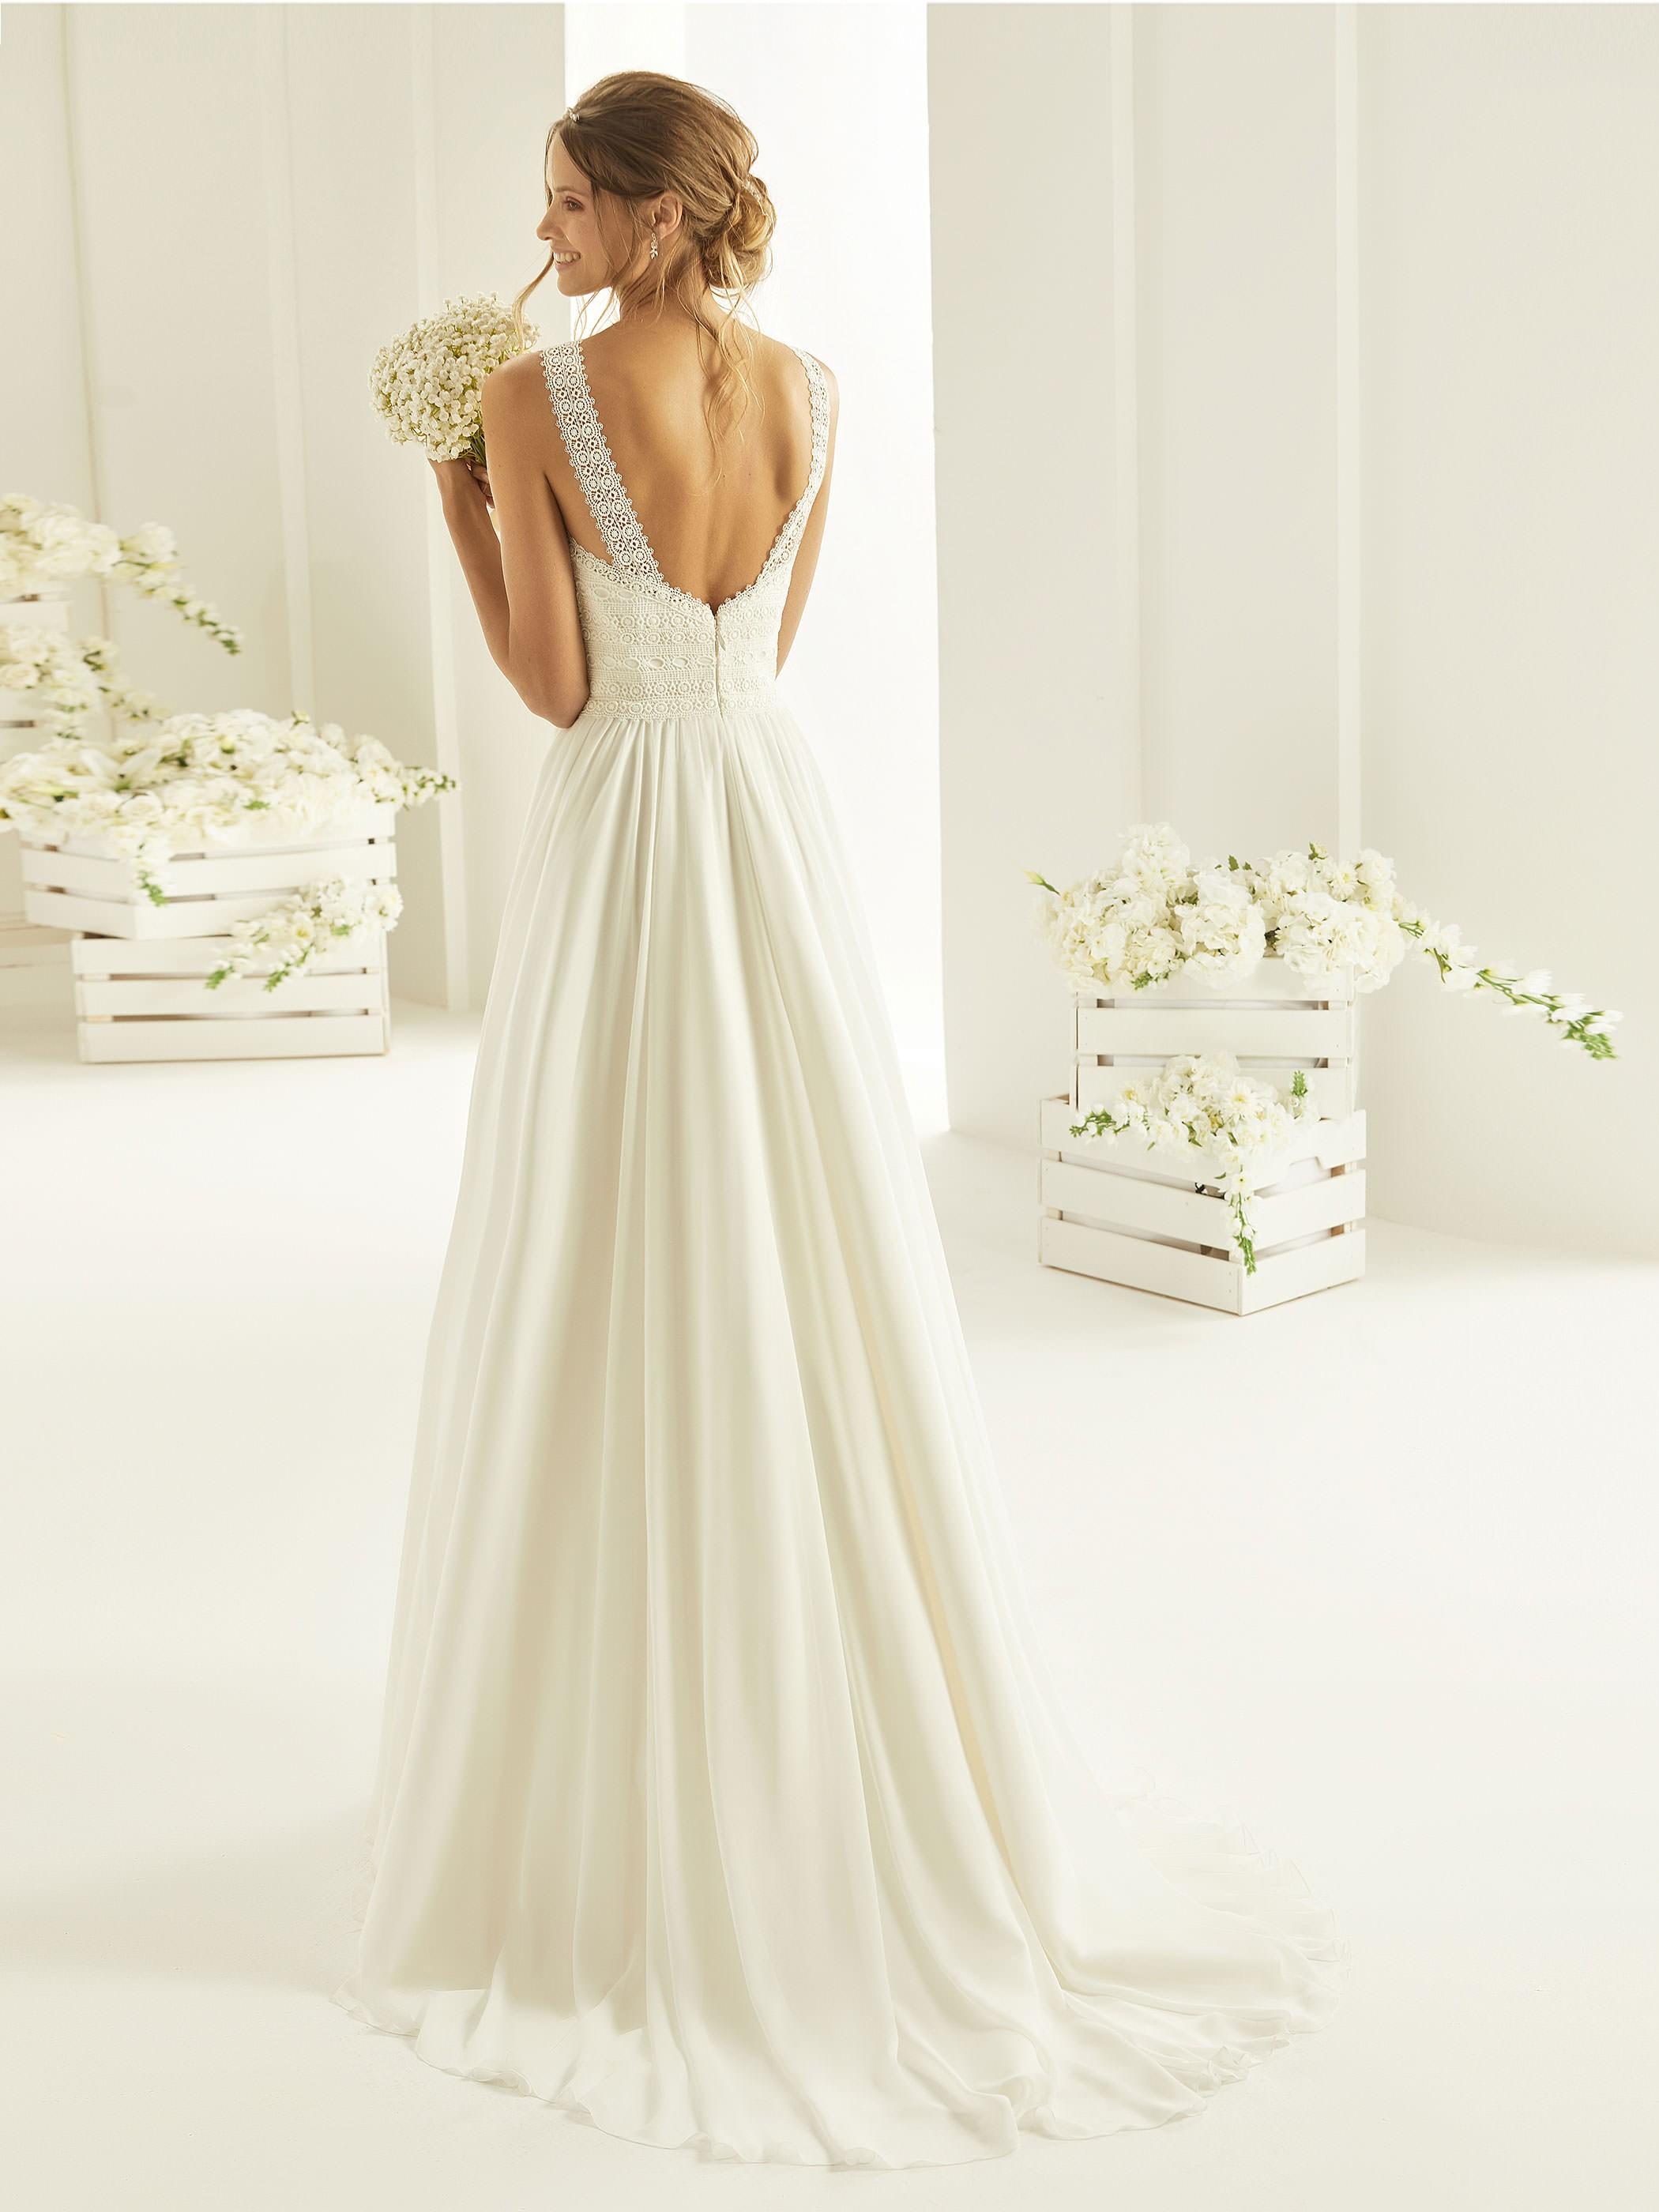 bianco-evento-bridal-dress-ophelia-_3_.j